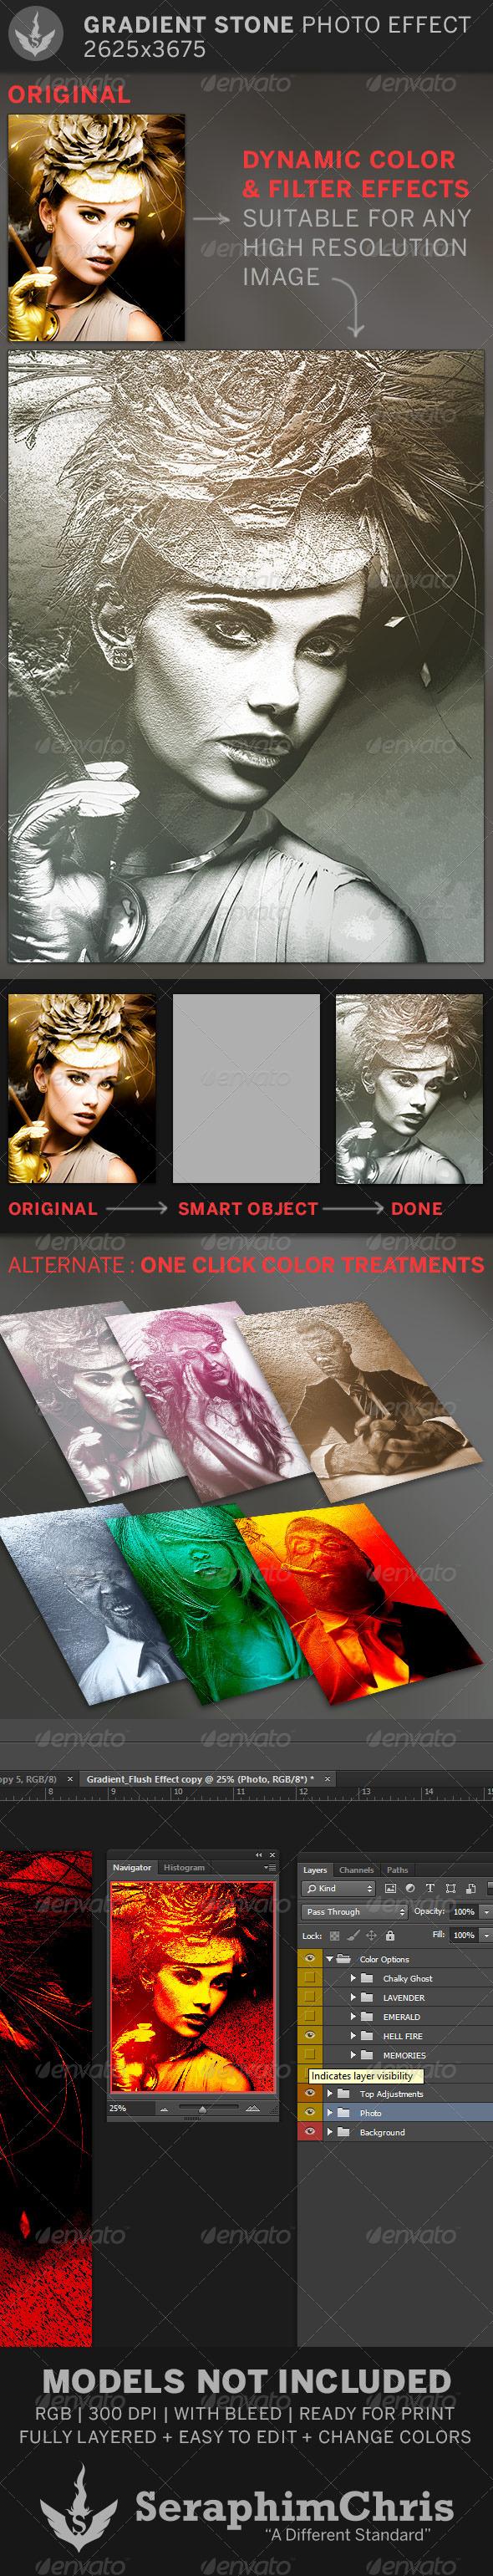 Gradient Stone Photo Effect Template - Artistic Photo Templates